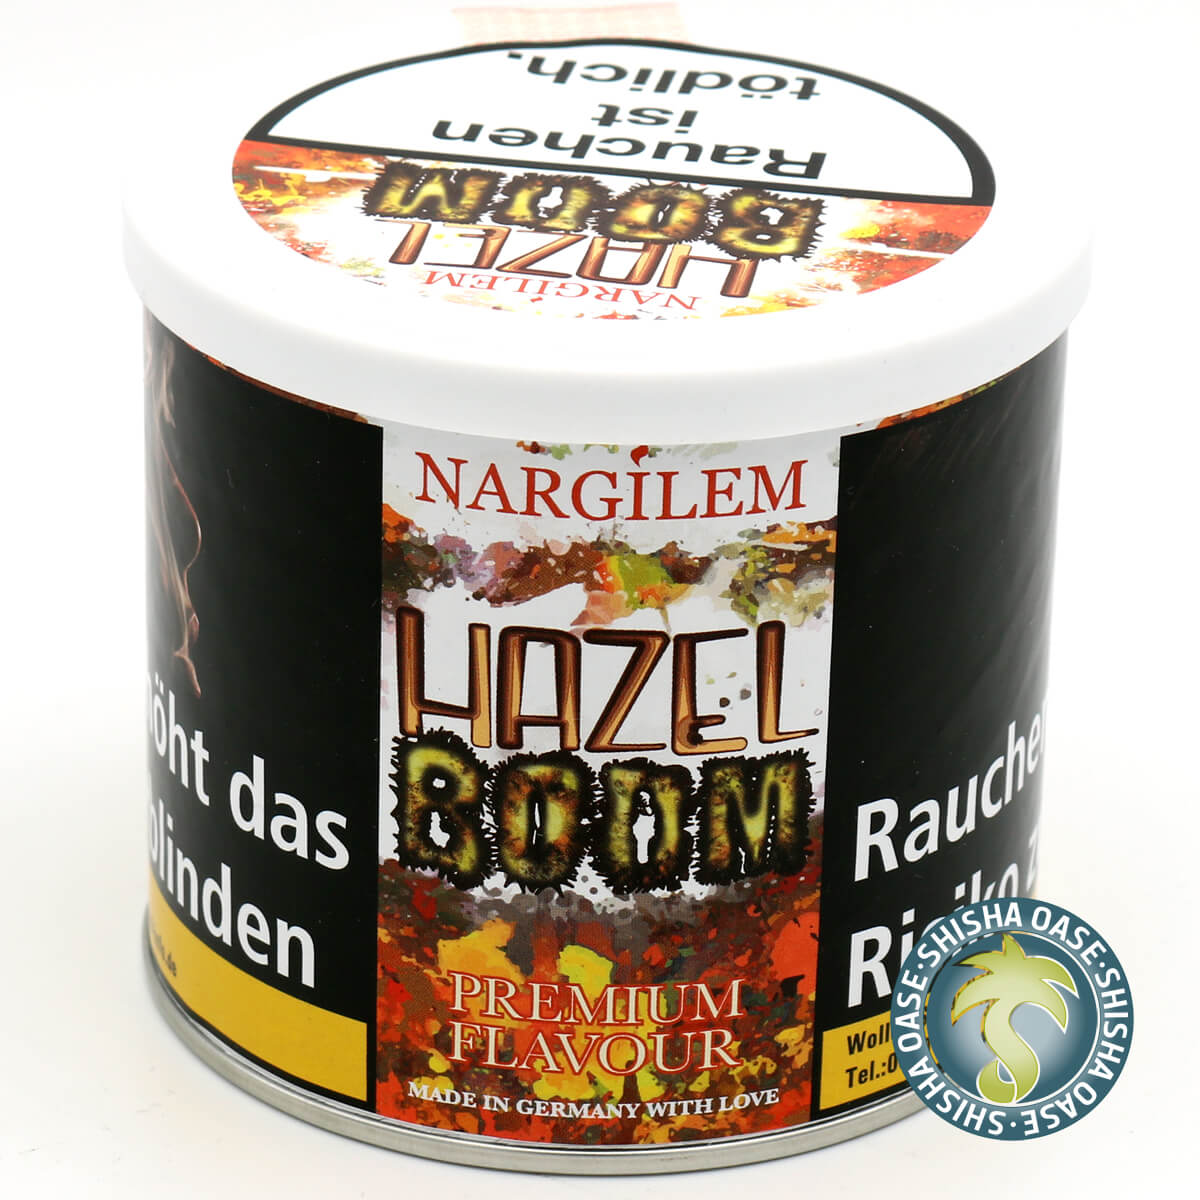 Nargilem Tabak Hazel Boom 200g Dose